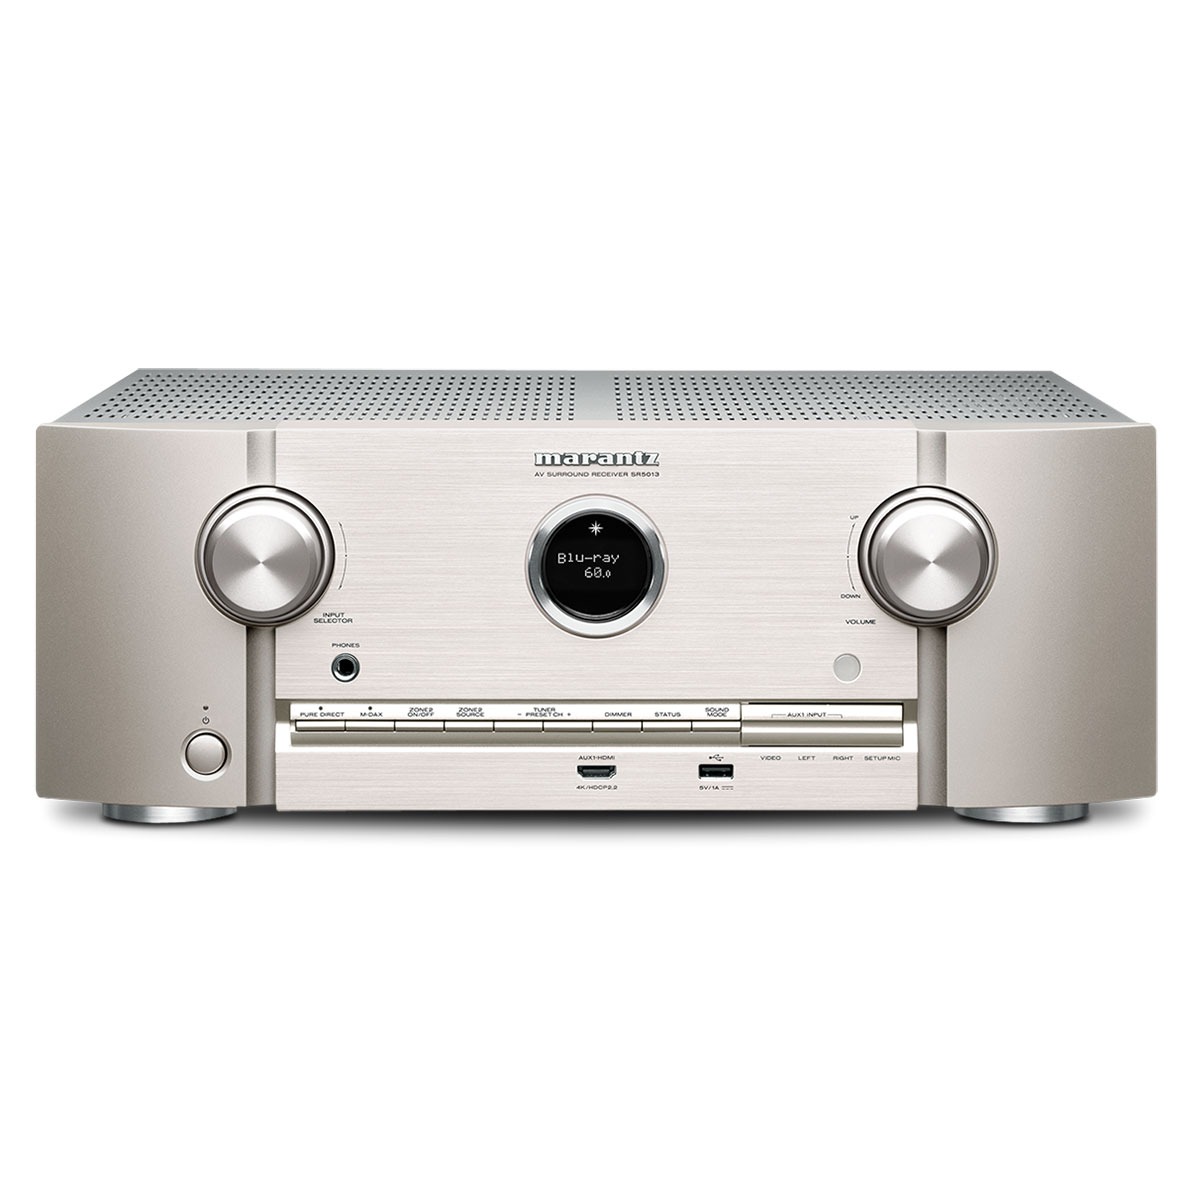 Ampli home cinéma Marantz SR5013 Argent/Or Ampli-tuner Home Cinema 7.2 - Multiroom HEOS - AirPlay 2 - Bluetooth - Wi-Fi - DTS:X - Dolby Atmos - Hi-Res Audio - 8 entrées HDMI - HDR - HDCP 2.2 - Full 4K - Compatible Amazon Alexa